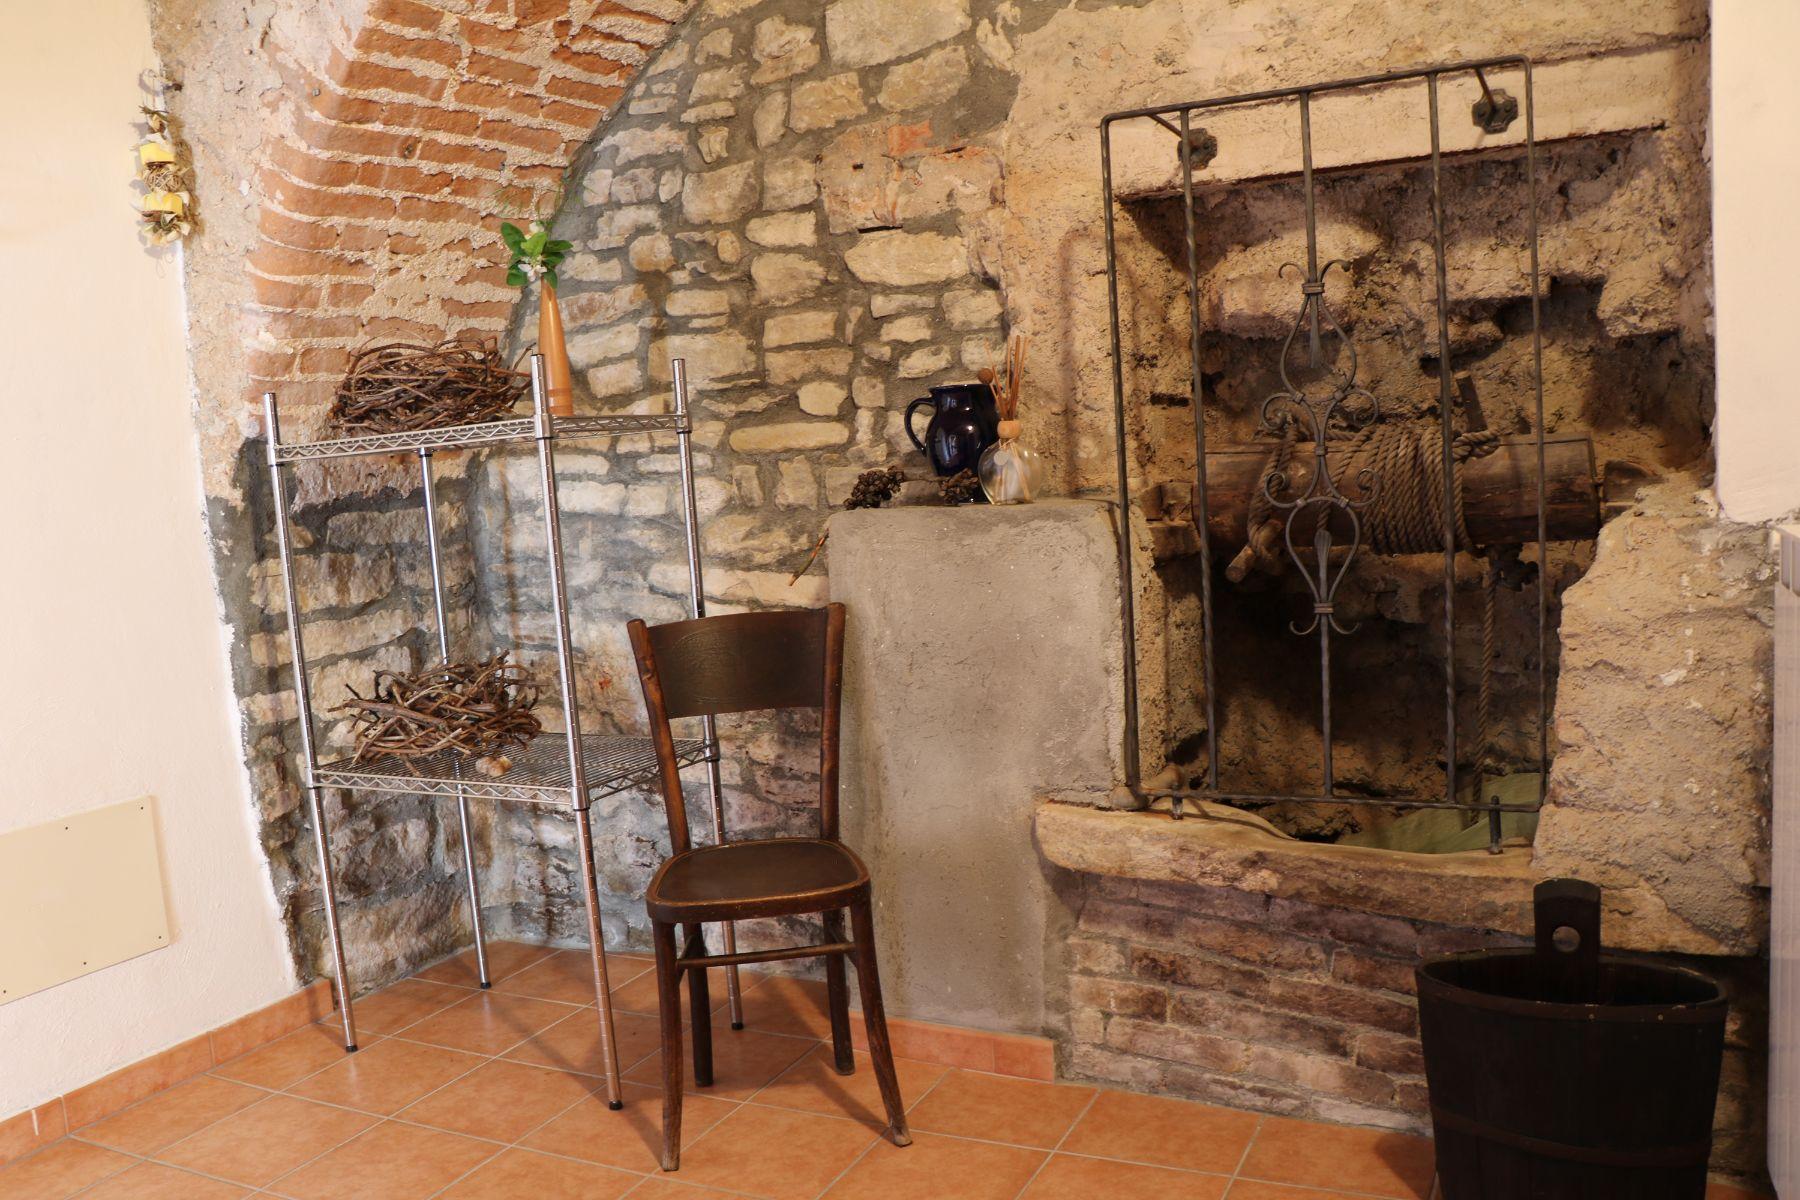 Casa Re, Piemonte - Doppelzimmer mit urigen Details | Double room with rustic details | Camera doppia con dettagli rustici